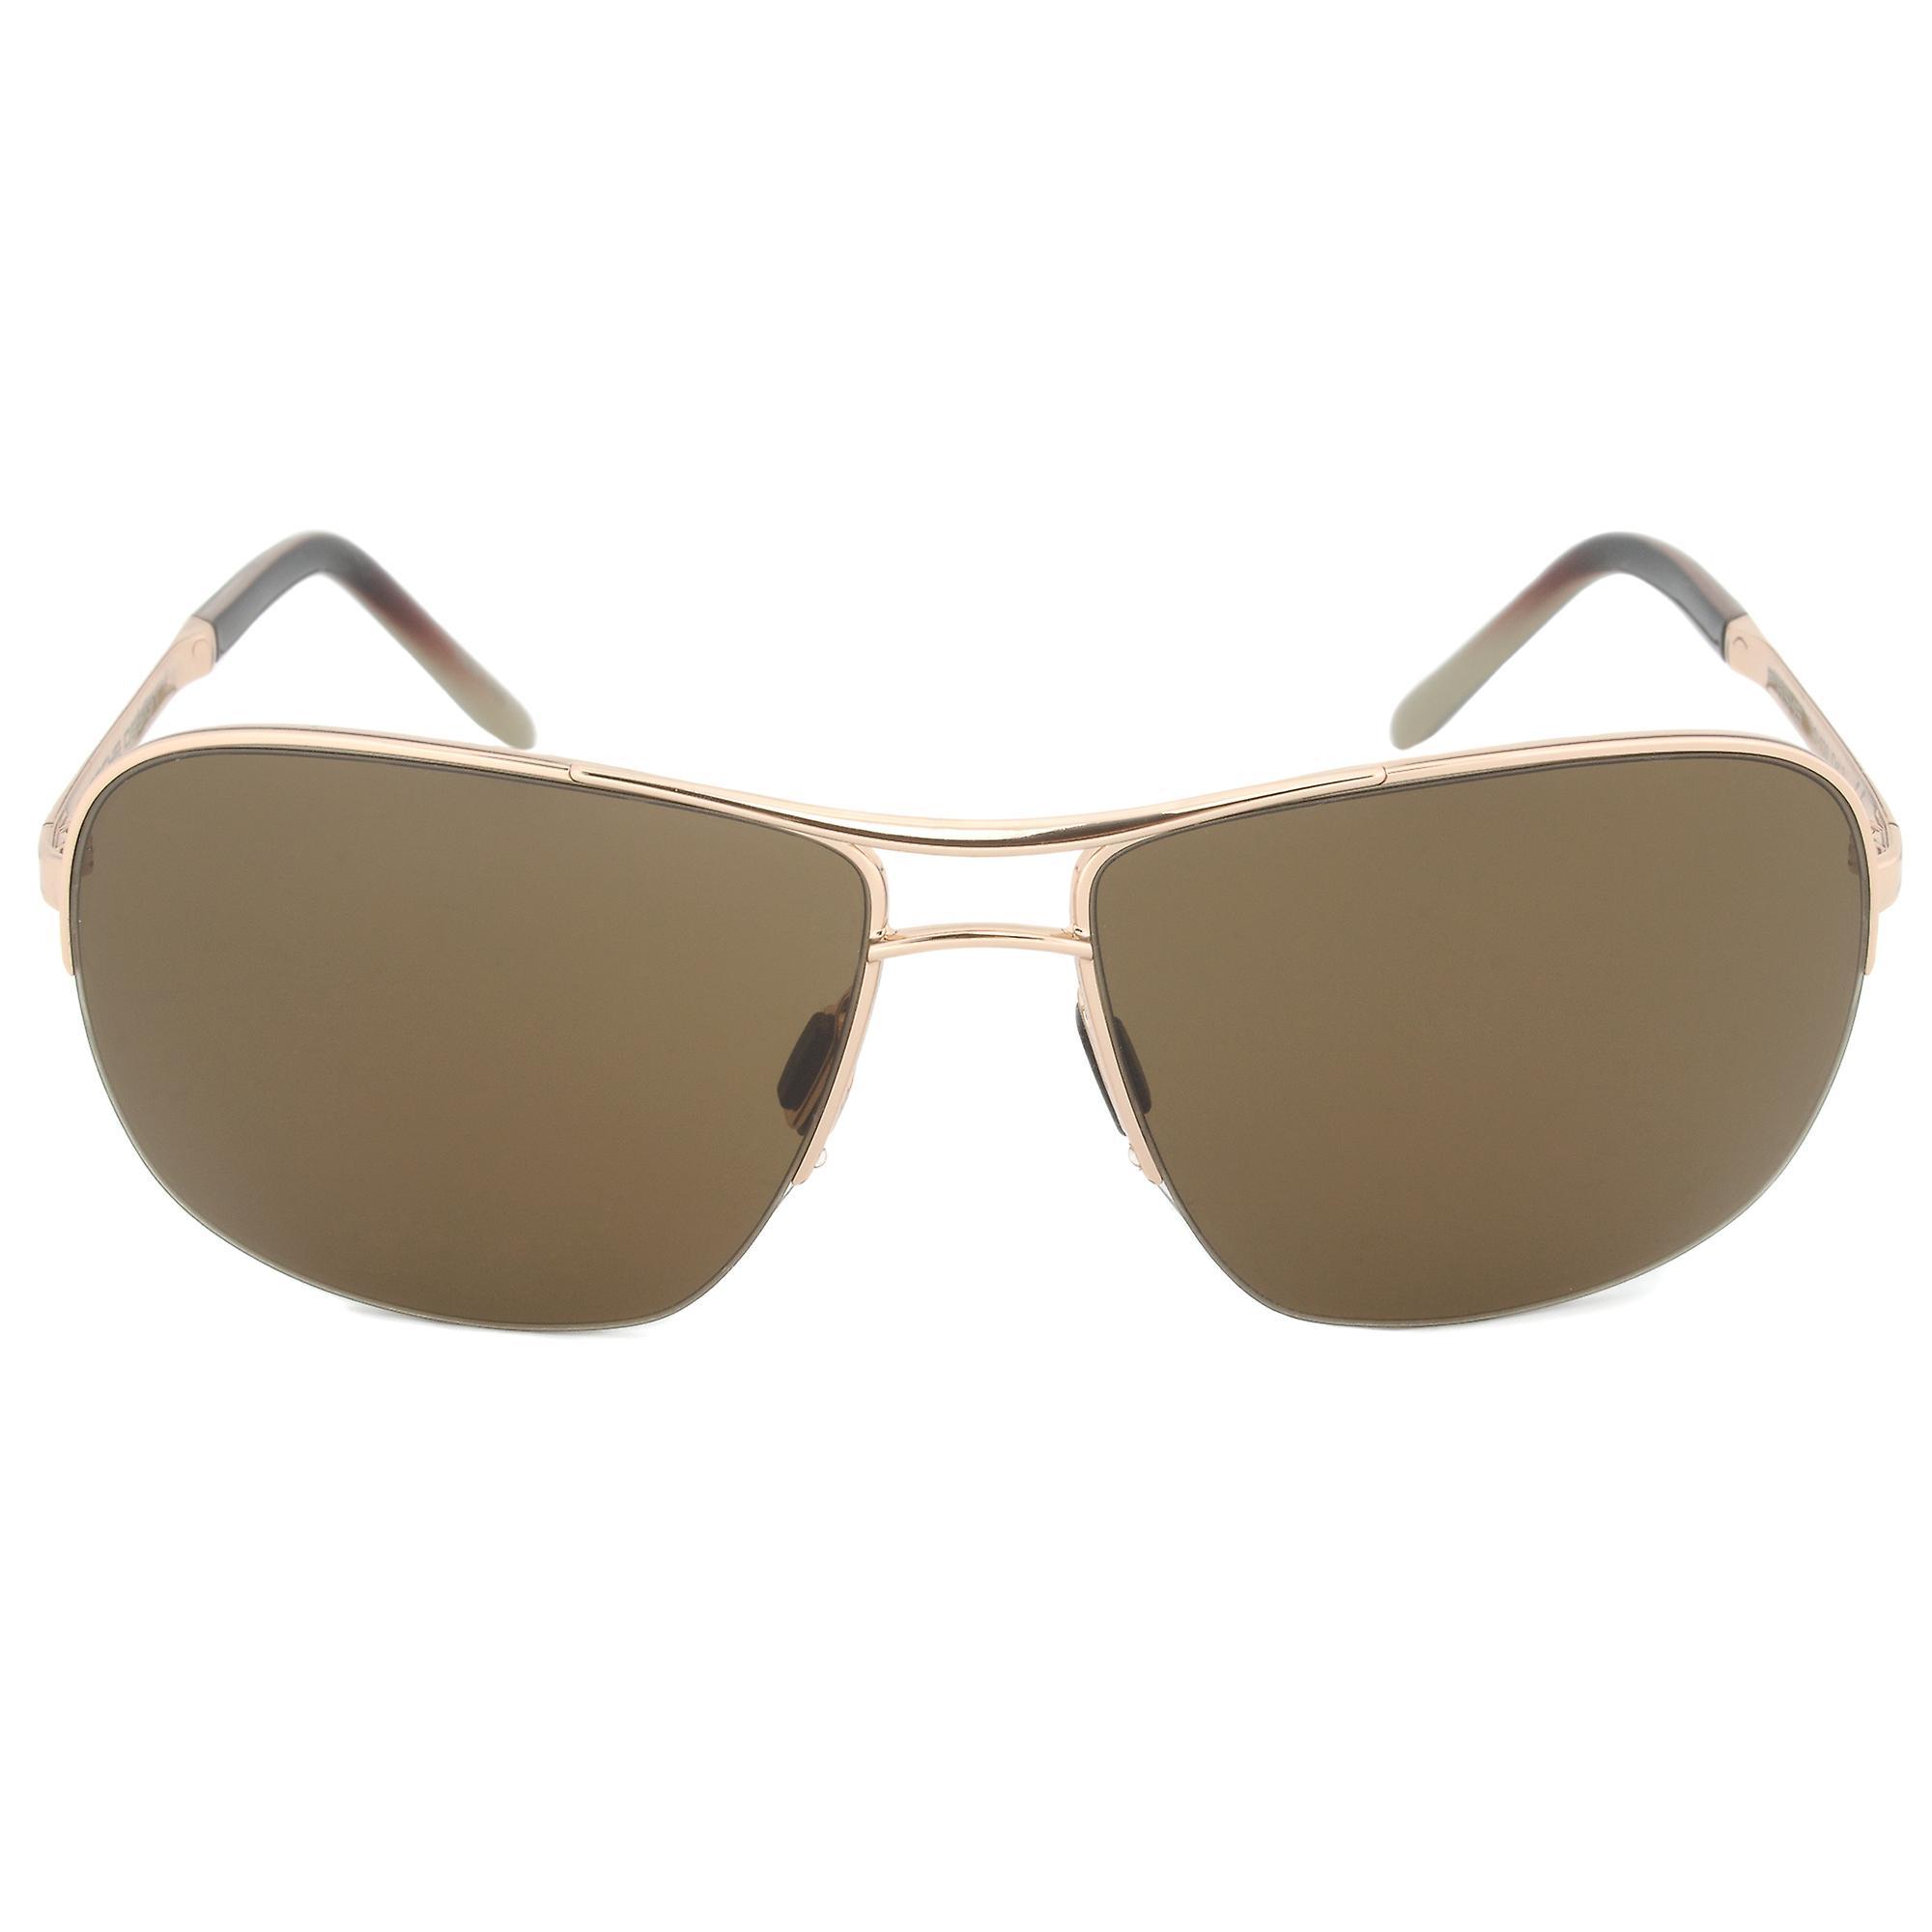 Porsche Design Design P8545 C Rectangular Sunglasses   or Frame   marron Lens